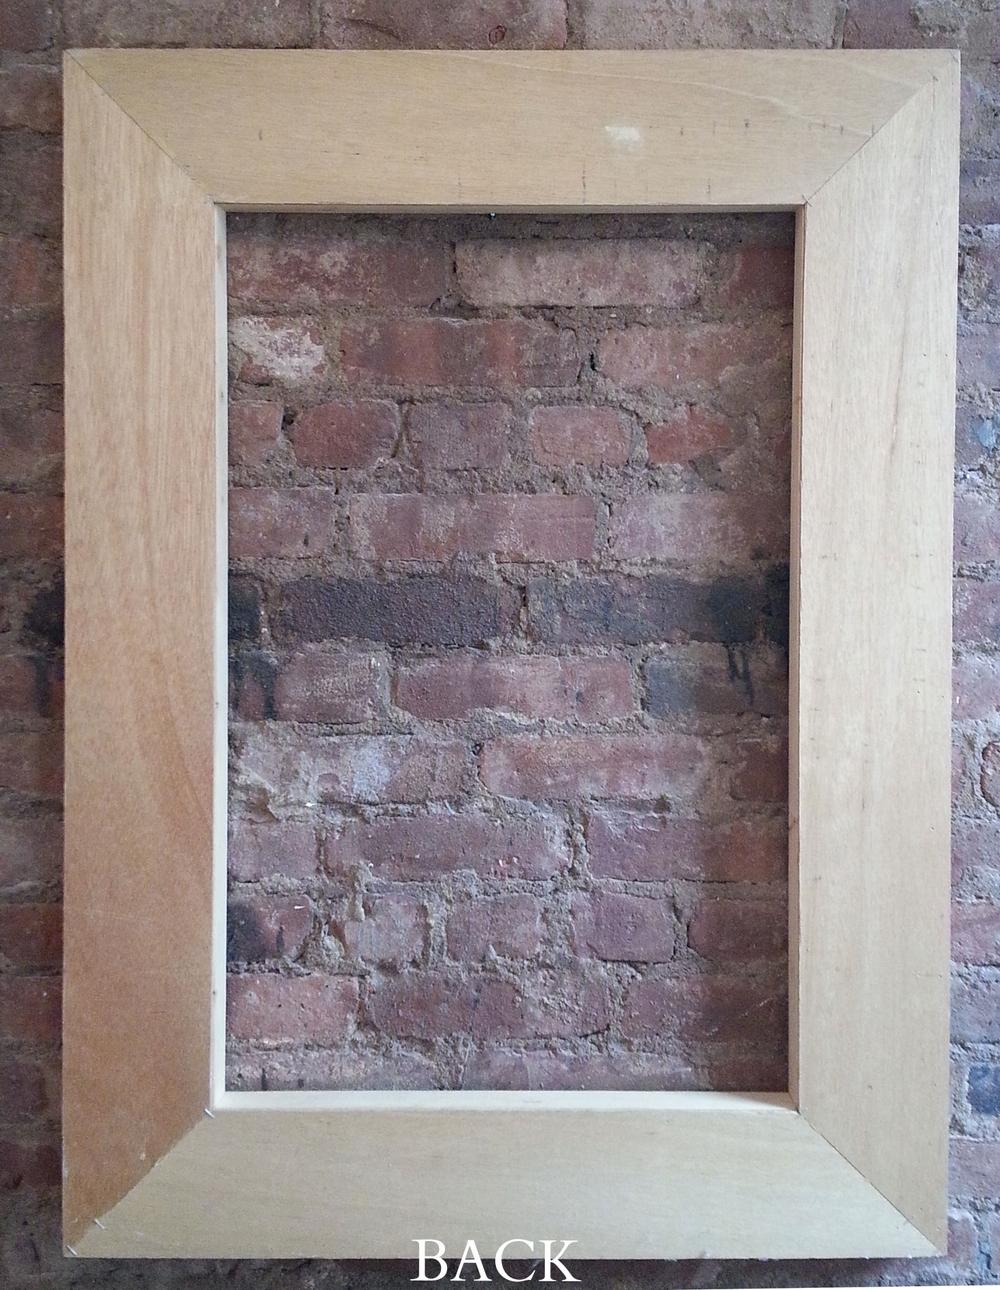 Back frame